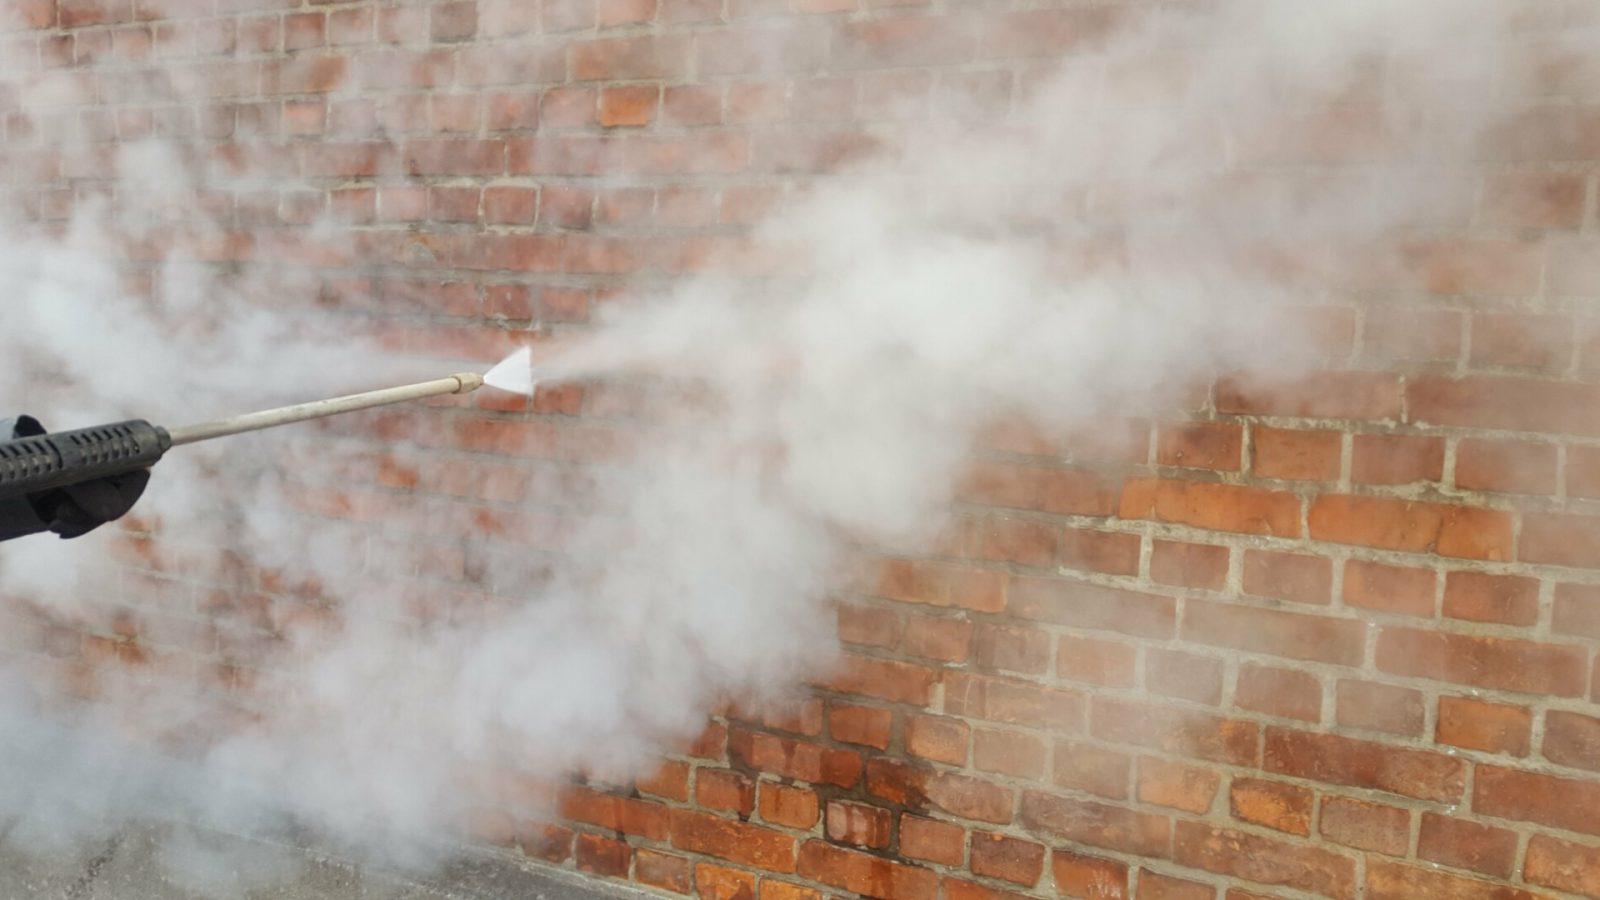 SteamPLUS® hogedruk/stoomreinigen